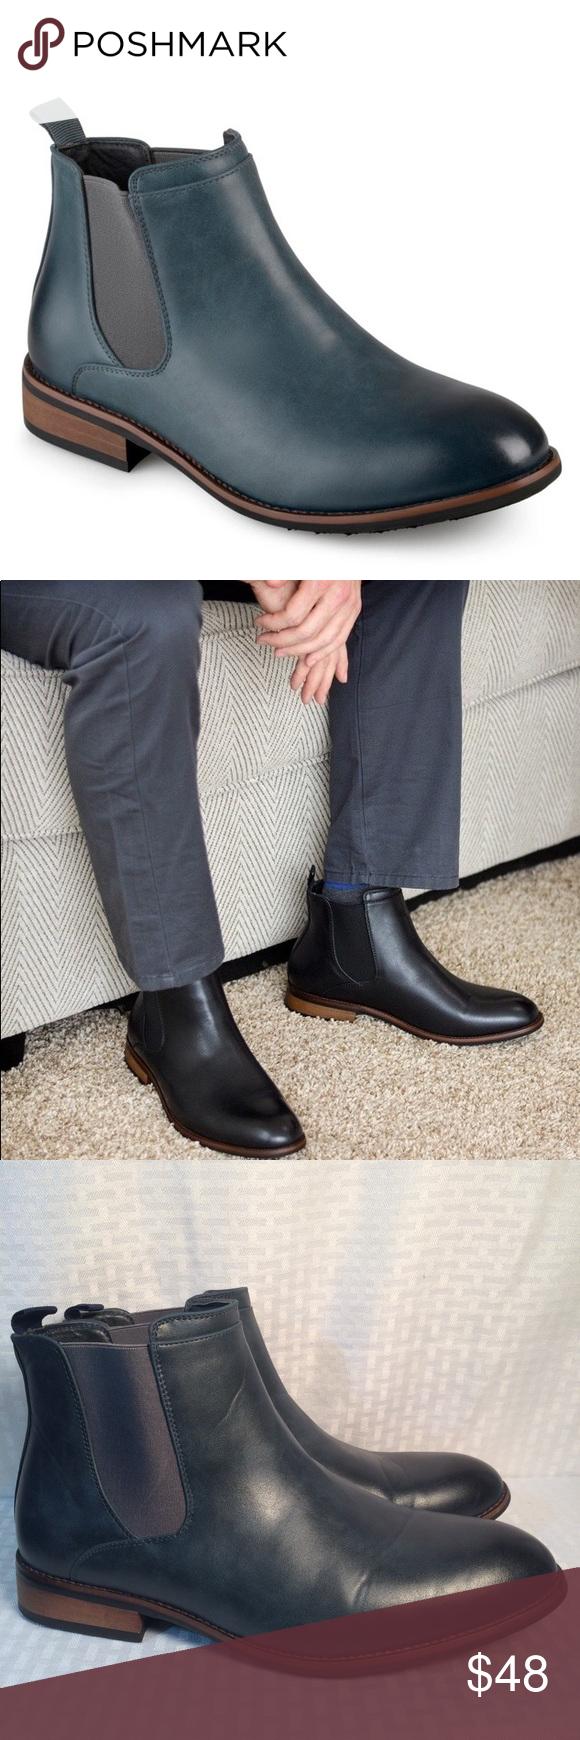 96456dfb98c Vance Co. Men s  Landon  Chelsea Dress ankle Boots Upscale design and sleek  design create the high-top Chelsea dress boot by Vance Co. a dapper look.